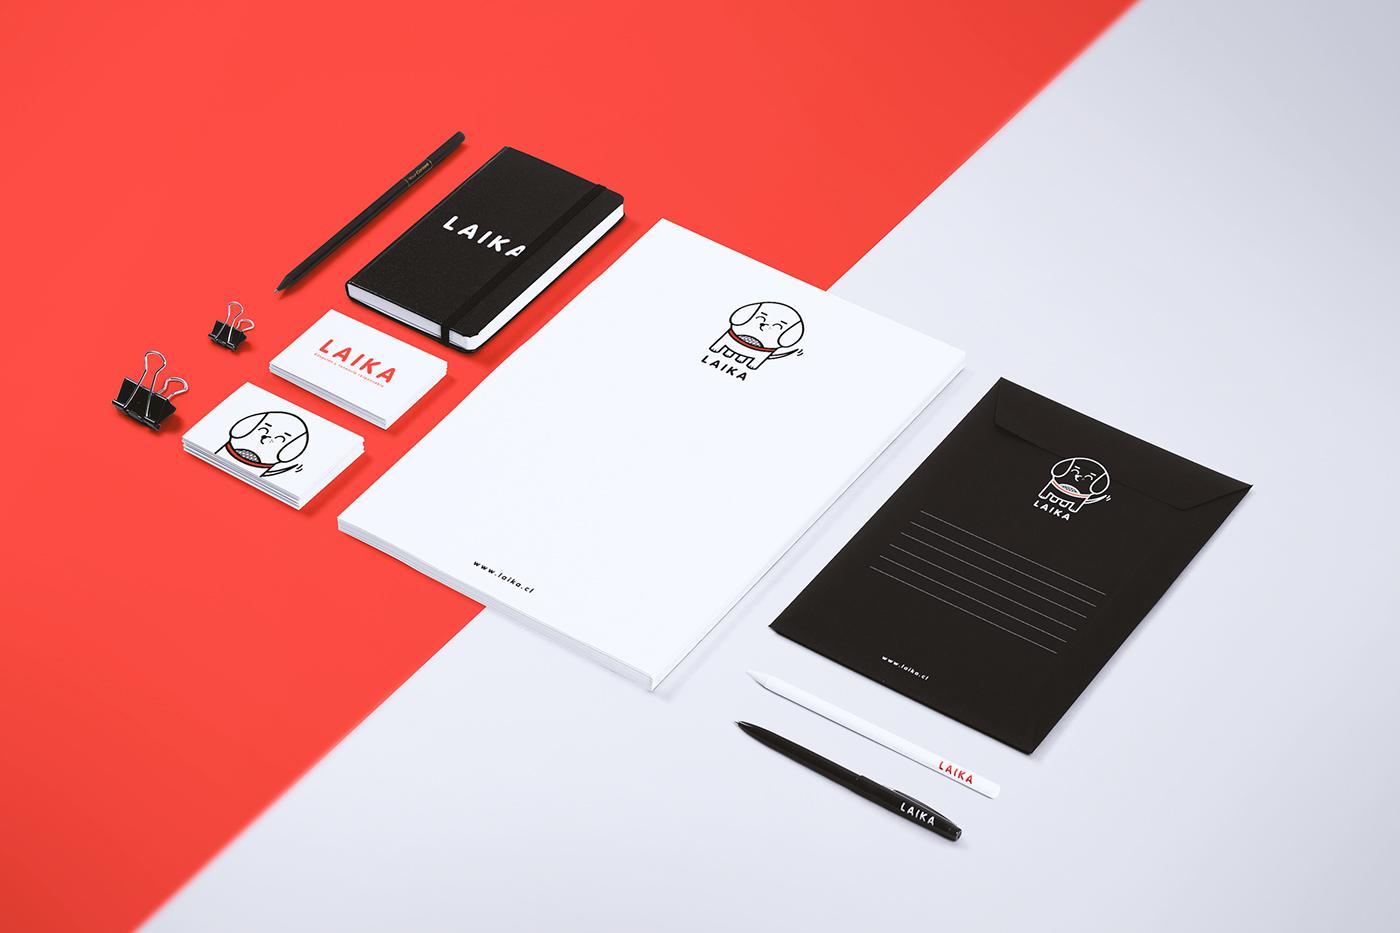 Branding kits for photographers